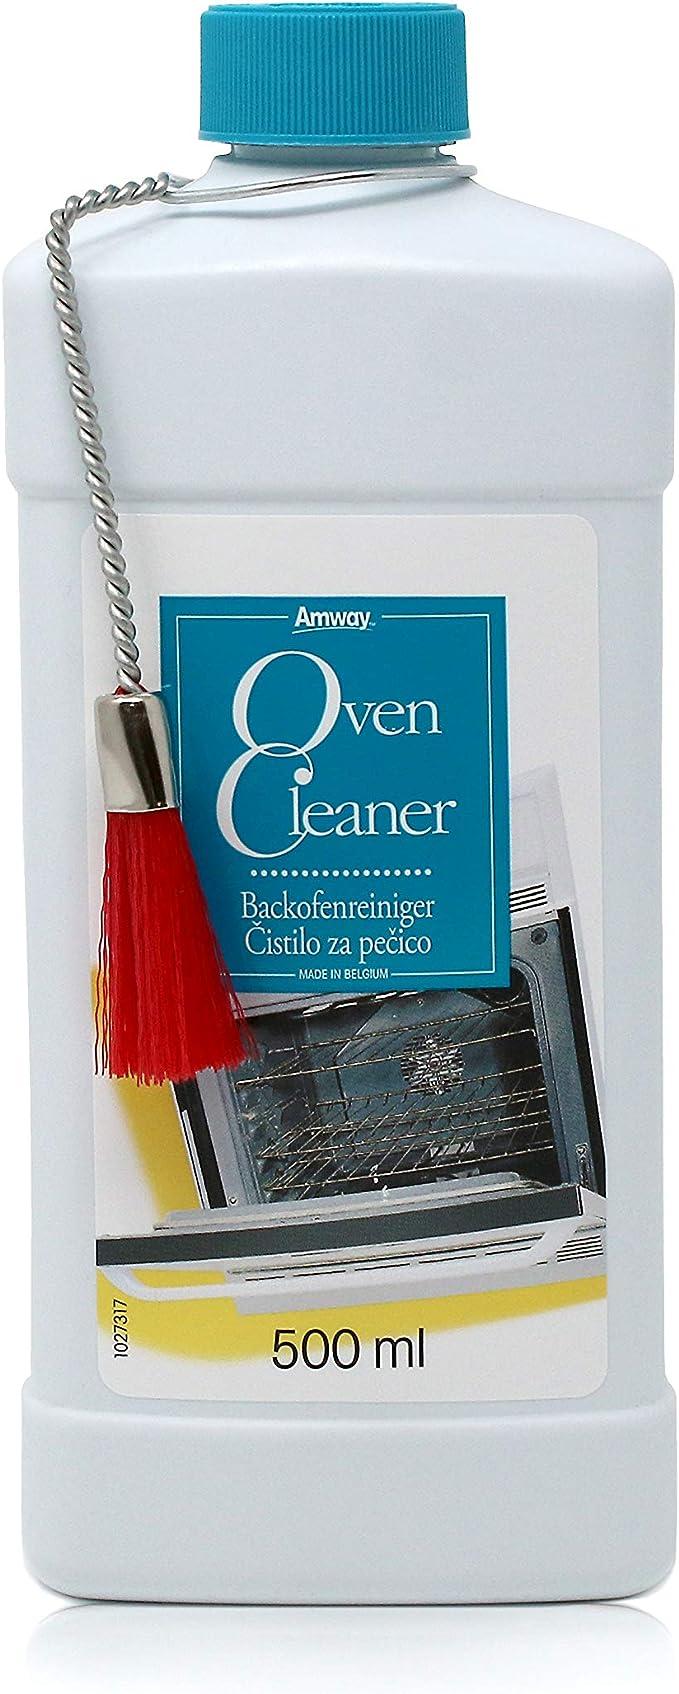 Limpiador de Hornos Pack 12 x 500 ml.: Amazon.es: Hogar